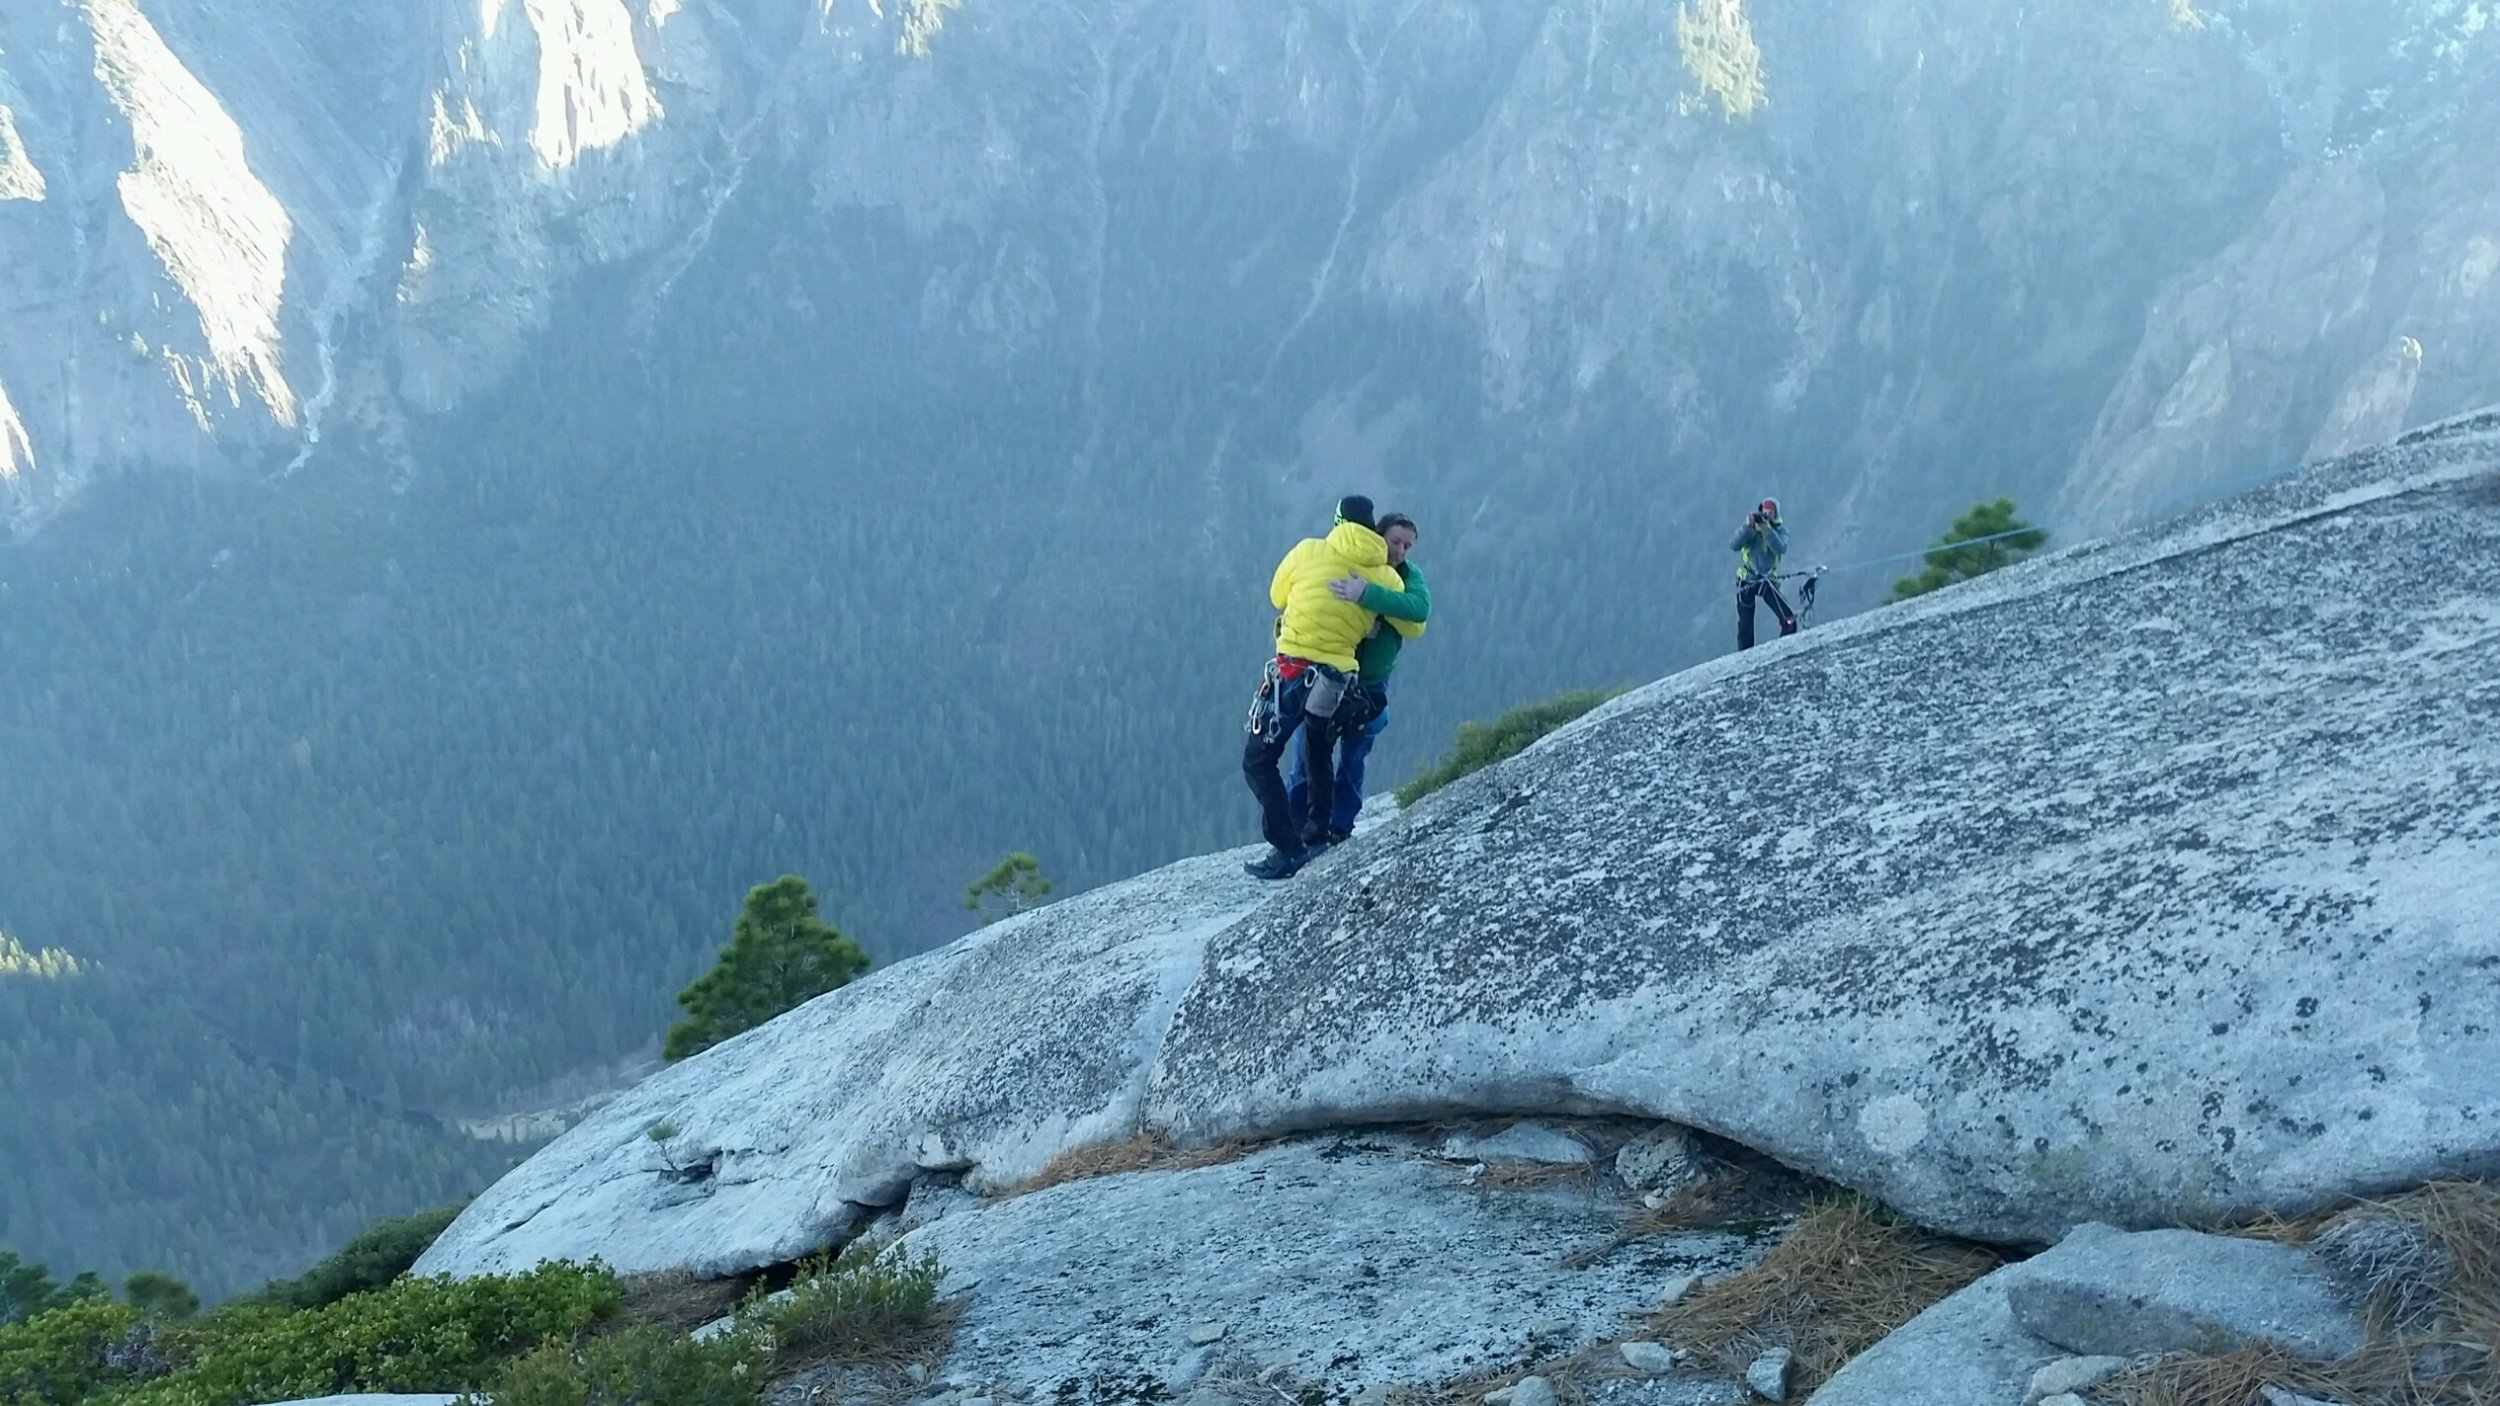 1-15-15 Yosemite 3